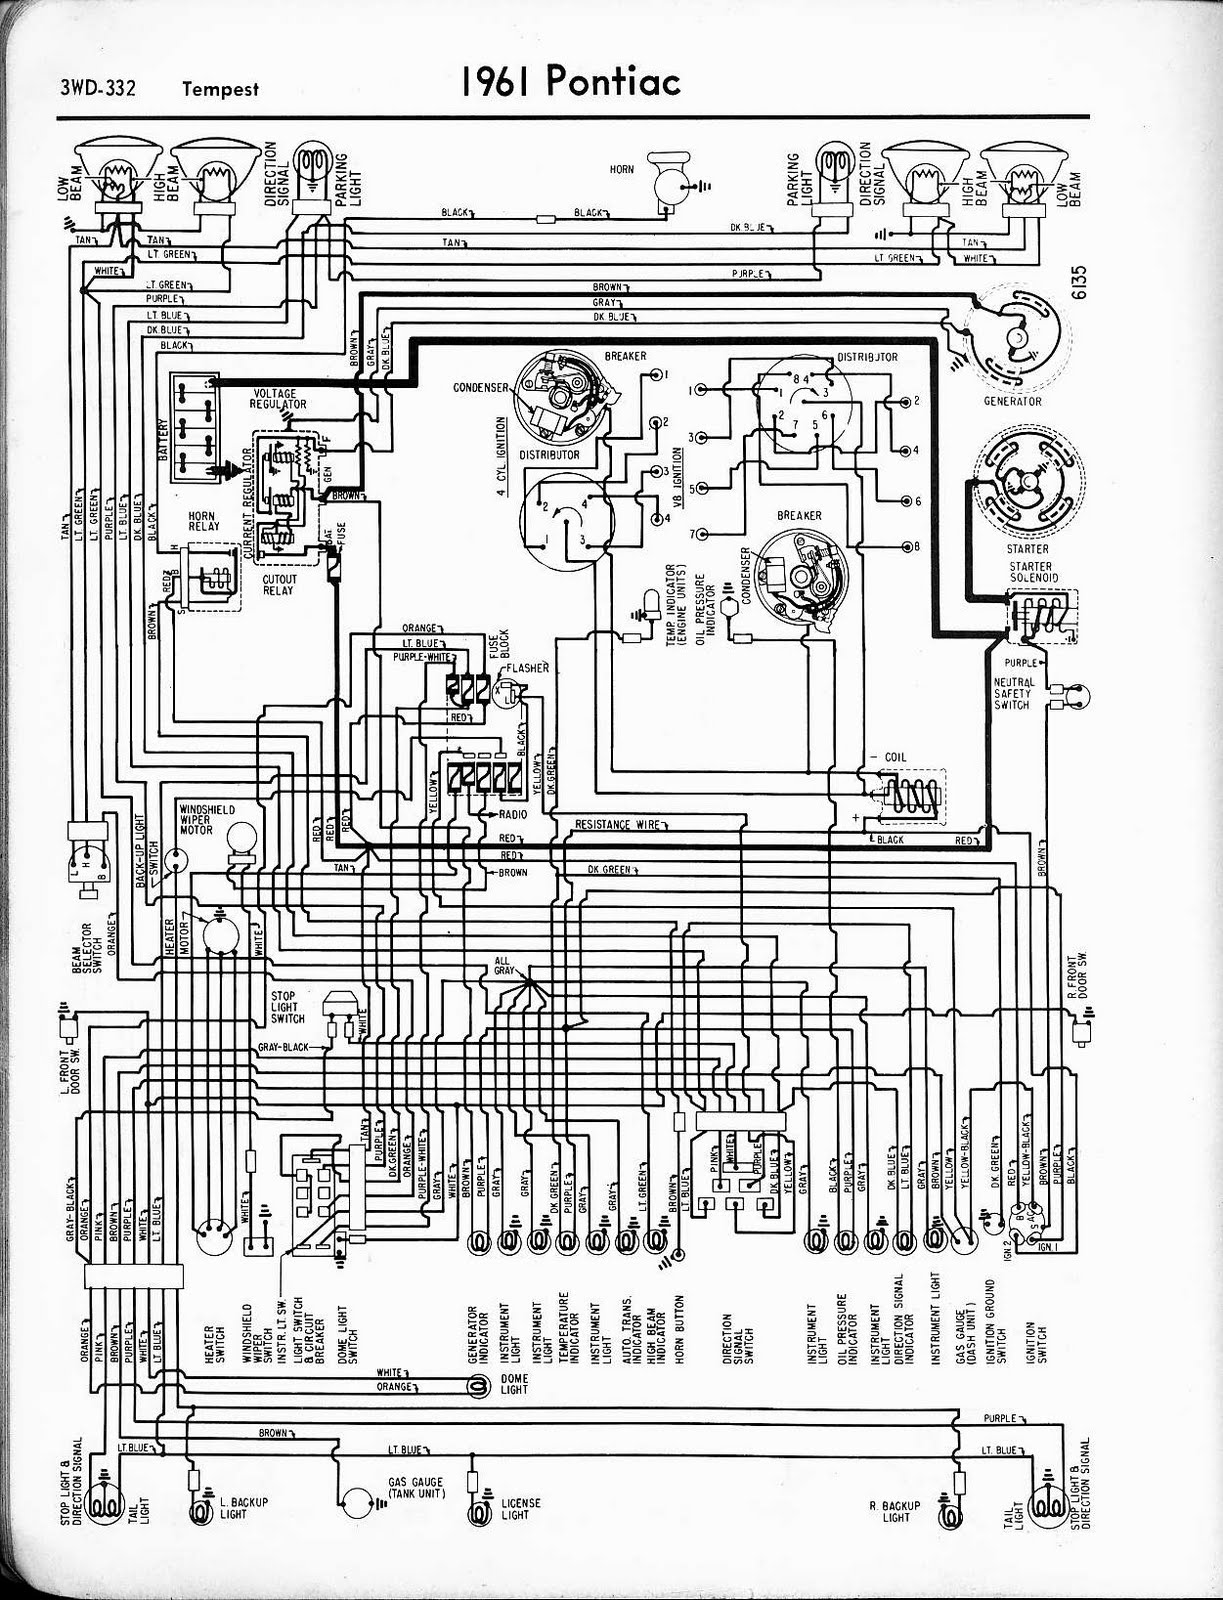 1969 Pontiac Gto Wiring Diagram 2001 Dodge Caravan 1970 Hood Tach Get Free Image About